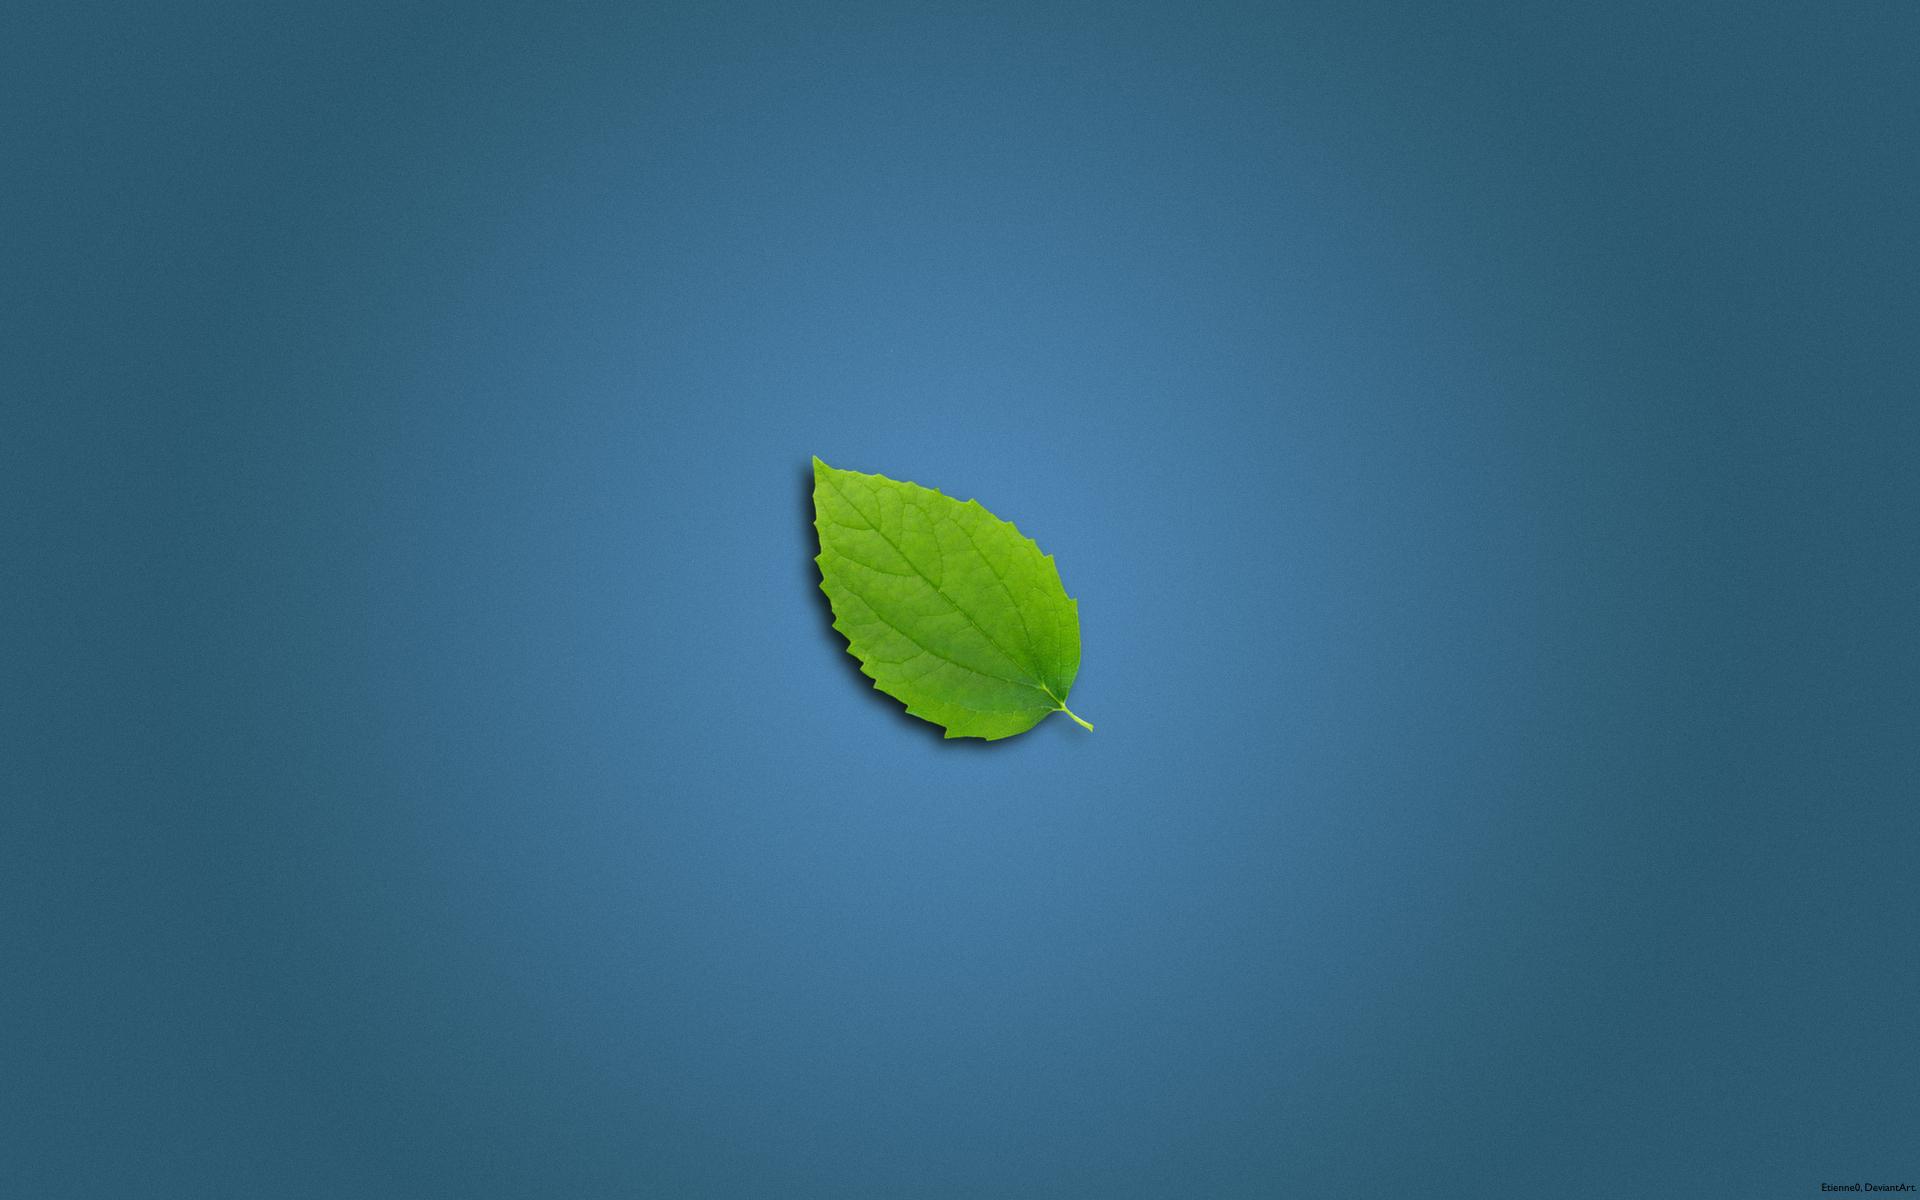 Clean Leaf Wallpapers   10018 1920x1200